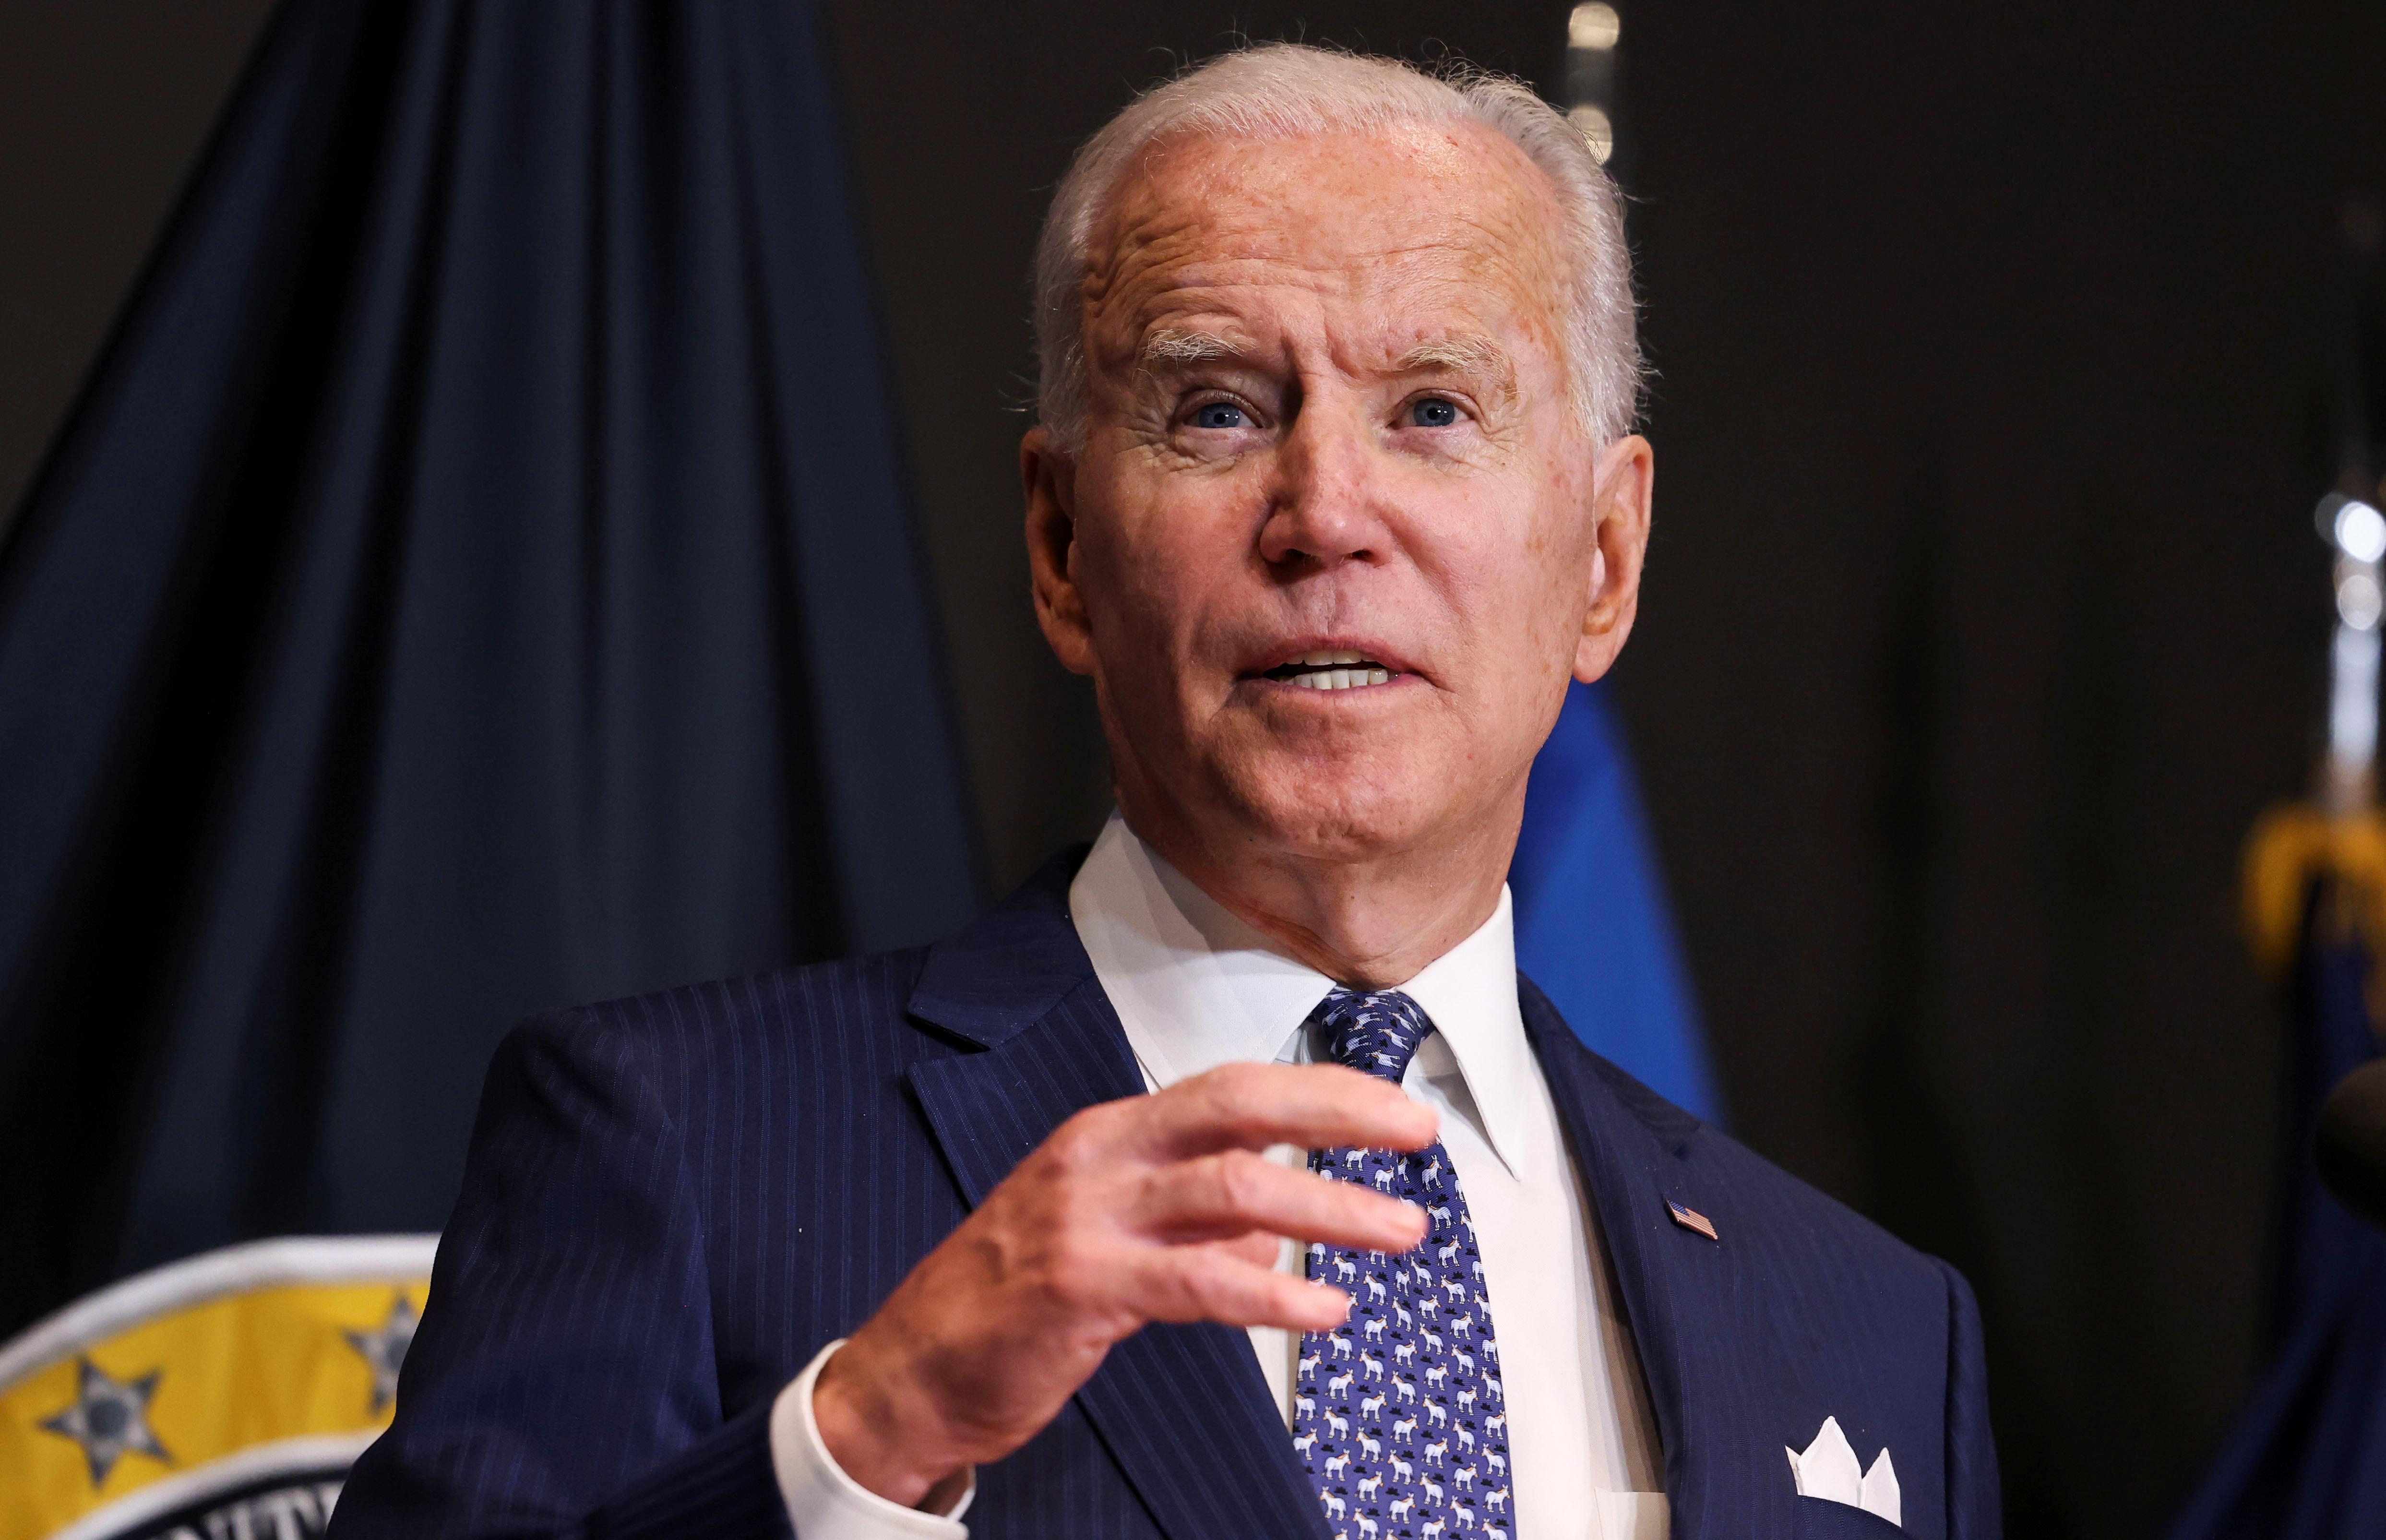 U.S. President Joe Biden delivers remarks to members of